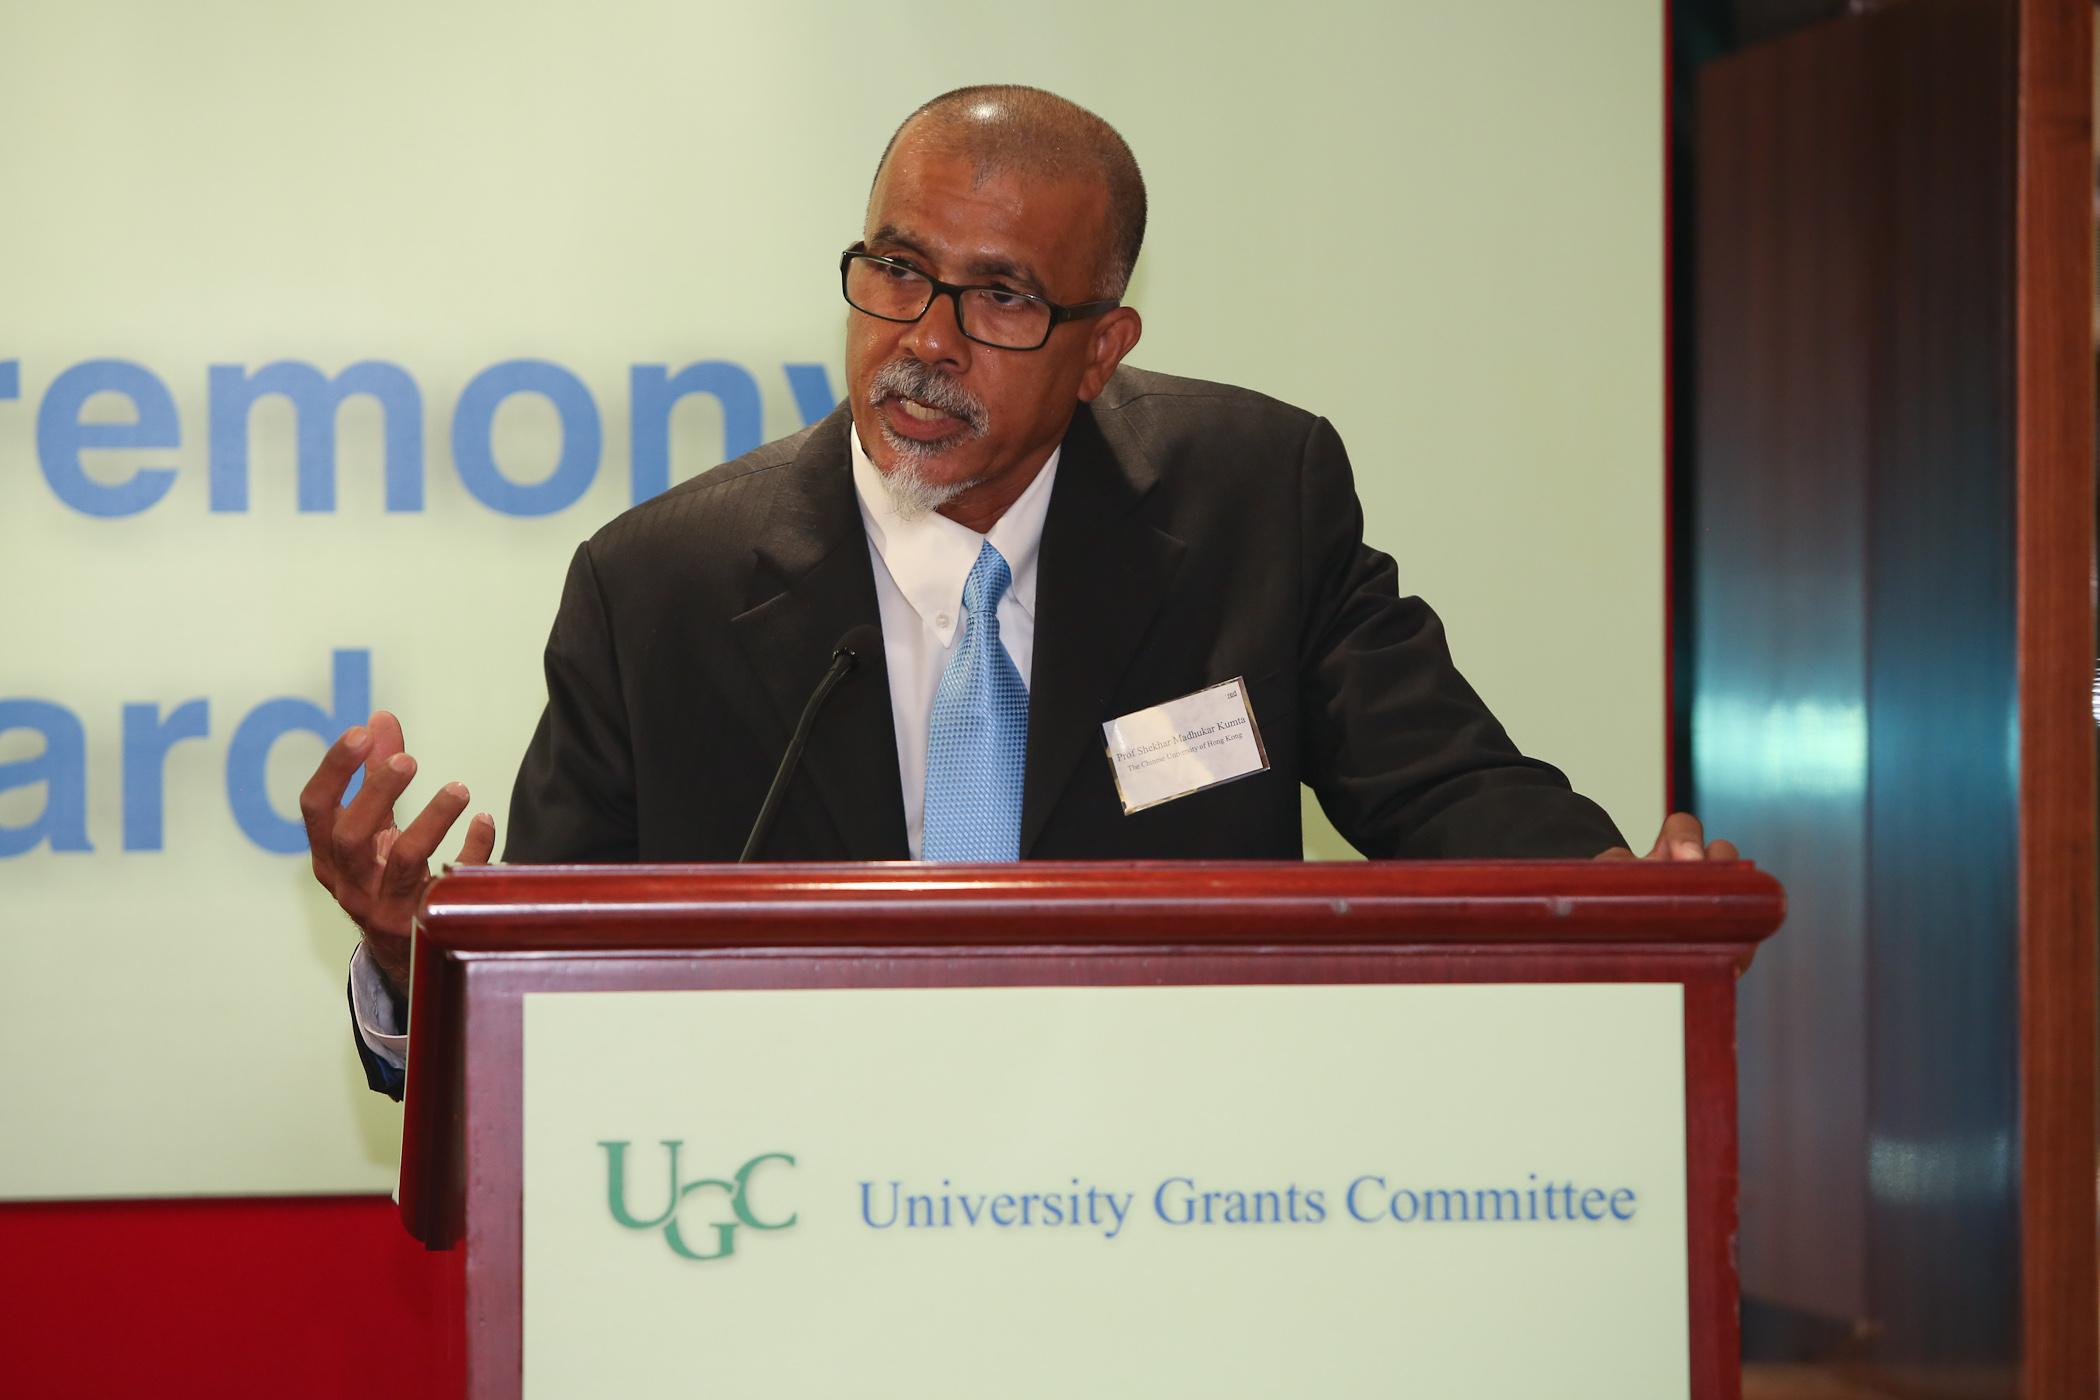 Professor Kumta delivers his acceptance speech.